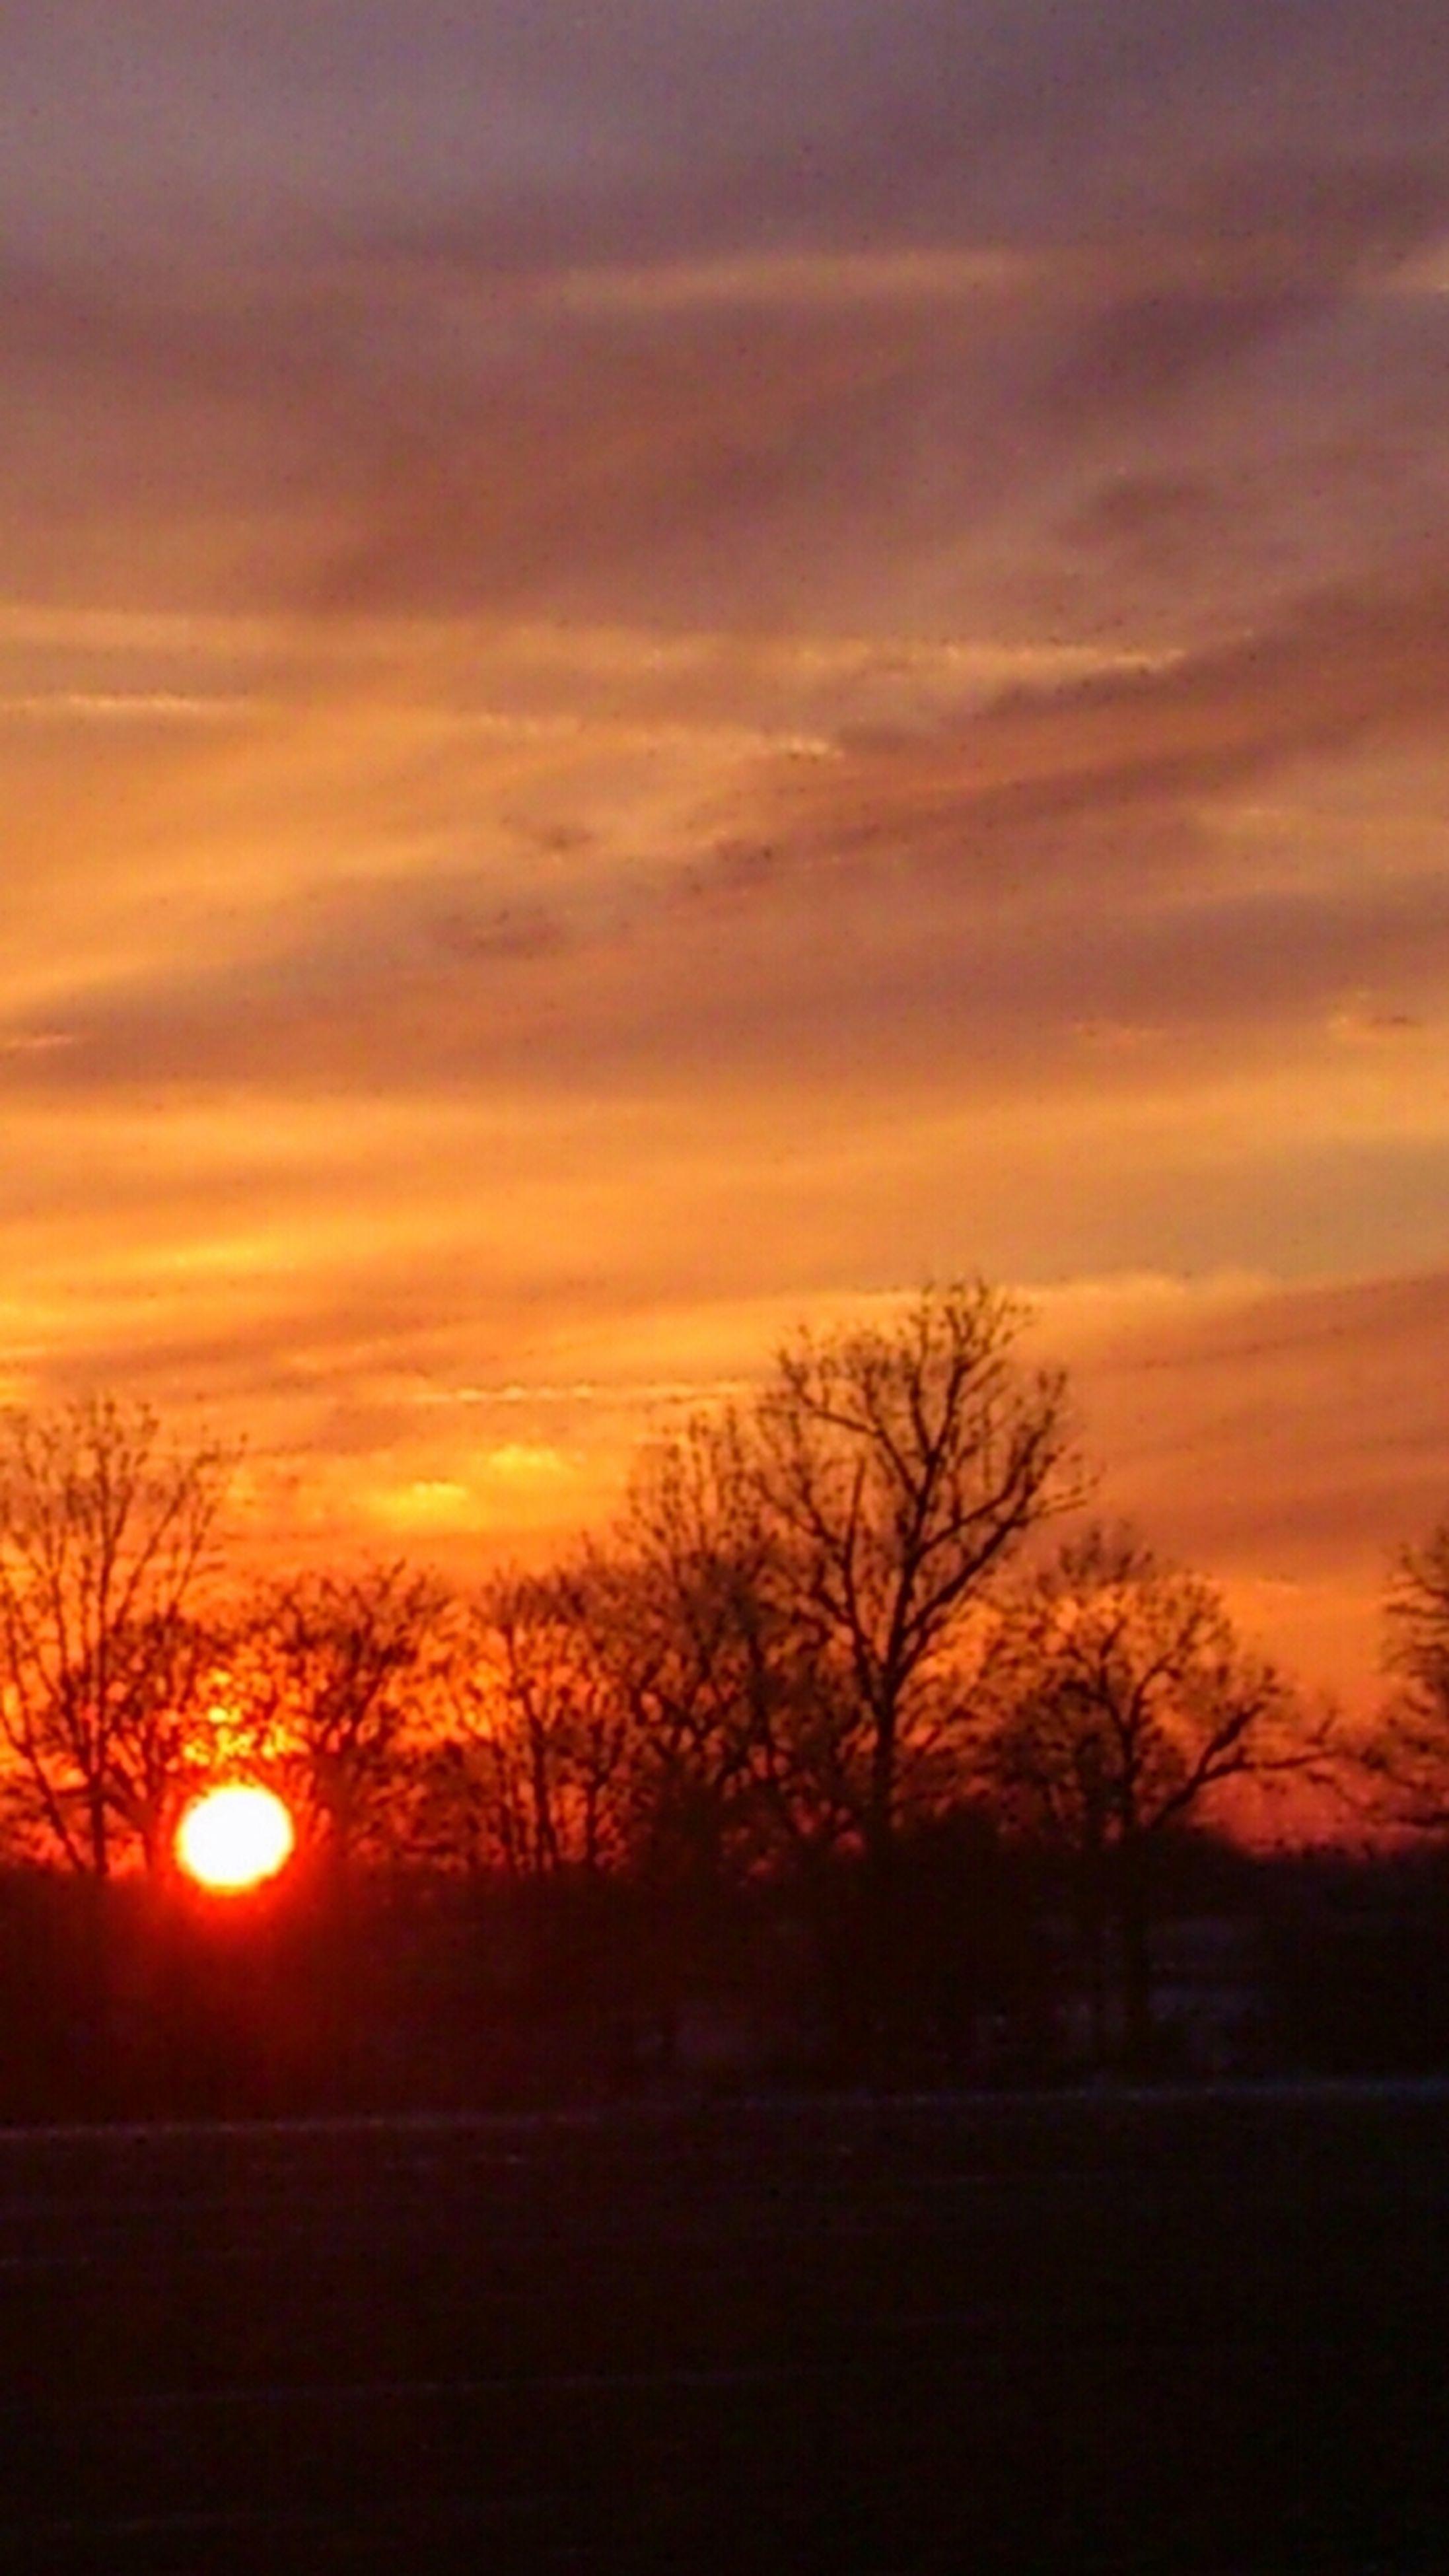 sunset, silhouette, orange color, sky, tranquil scene, tranquility, bare tree, scenics, tree, beauty in nature, landscape, field, sun, nature, idyllic, cloud - sky, dramatic sky, branch, cloud, outdoors